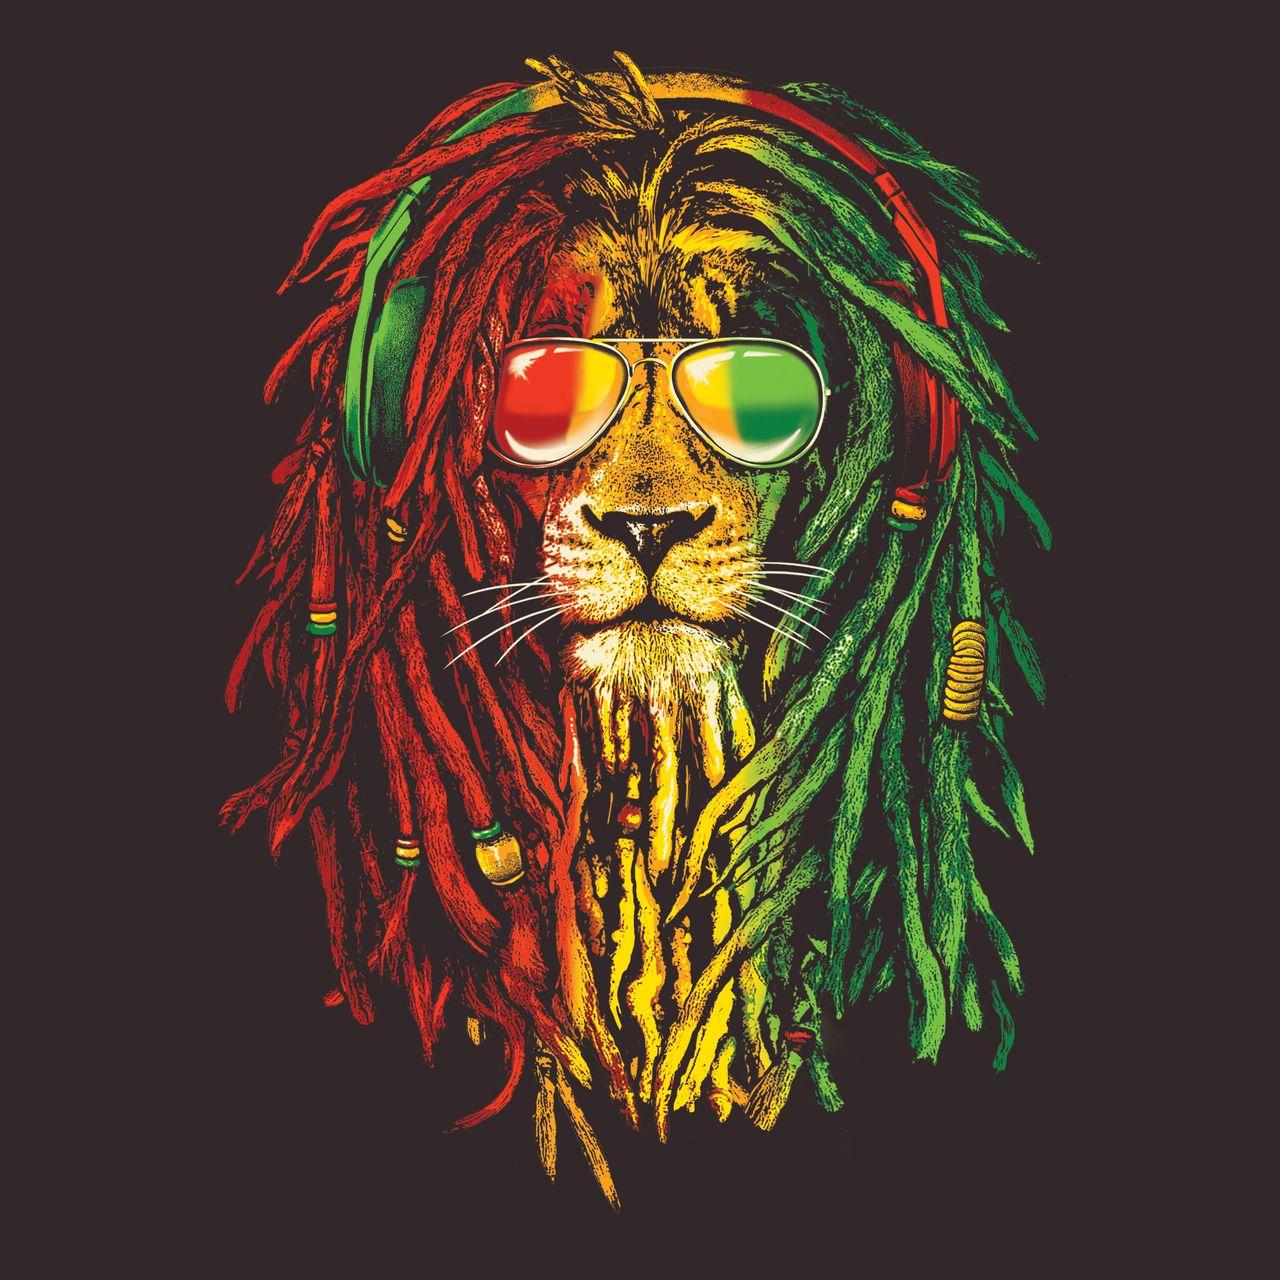 Imagens Reggae ~ Rasta Vibe Lion T Shirt The Duck Company Adult Tees t shirts rasta Pinterest Lions